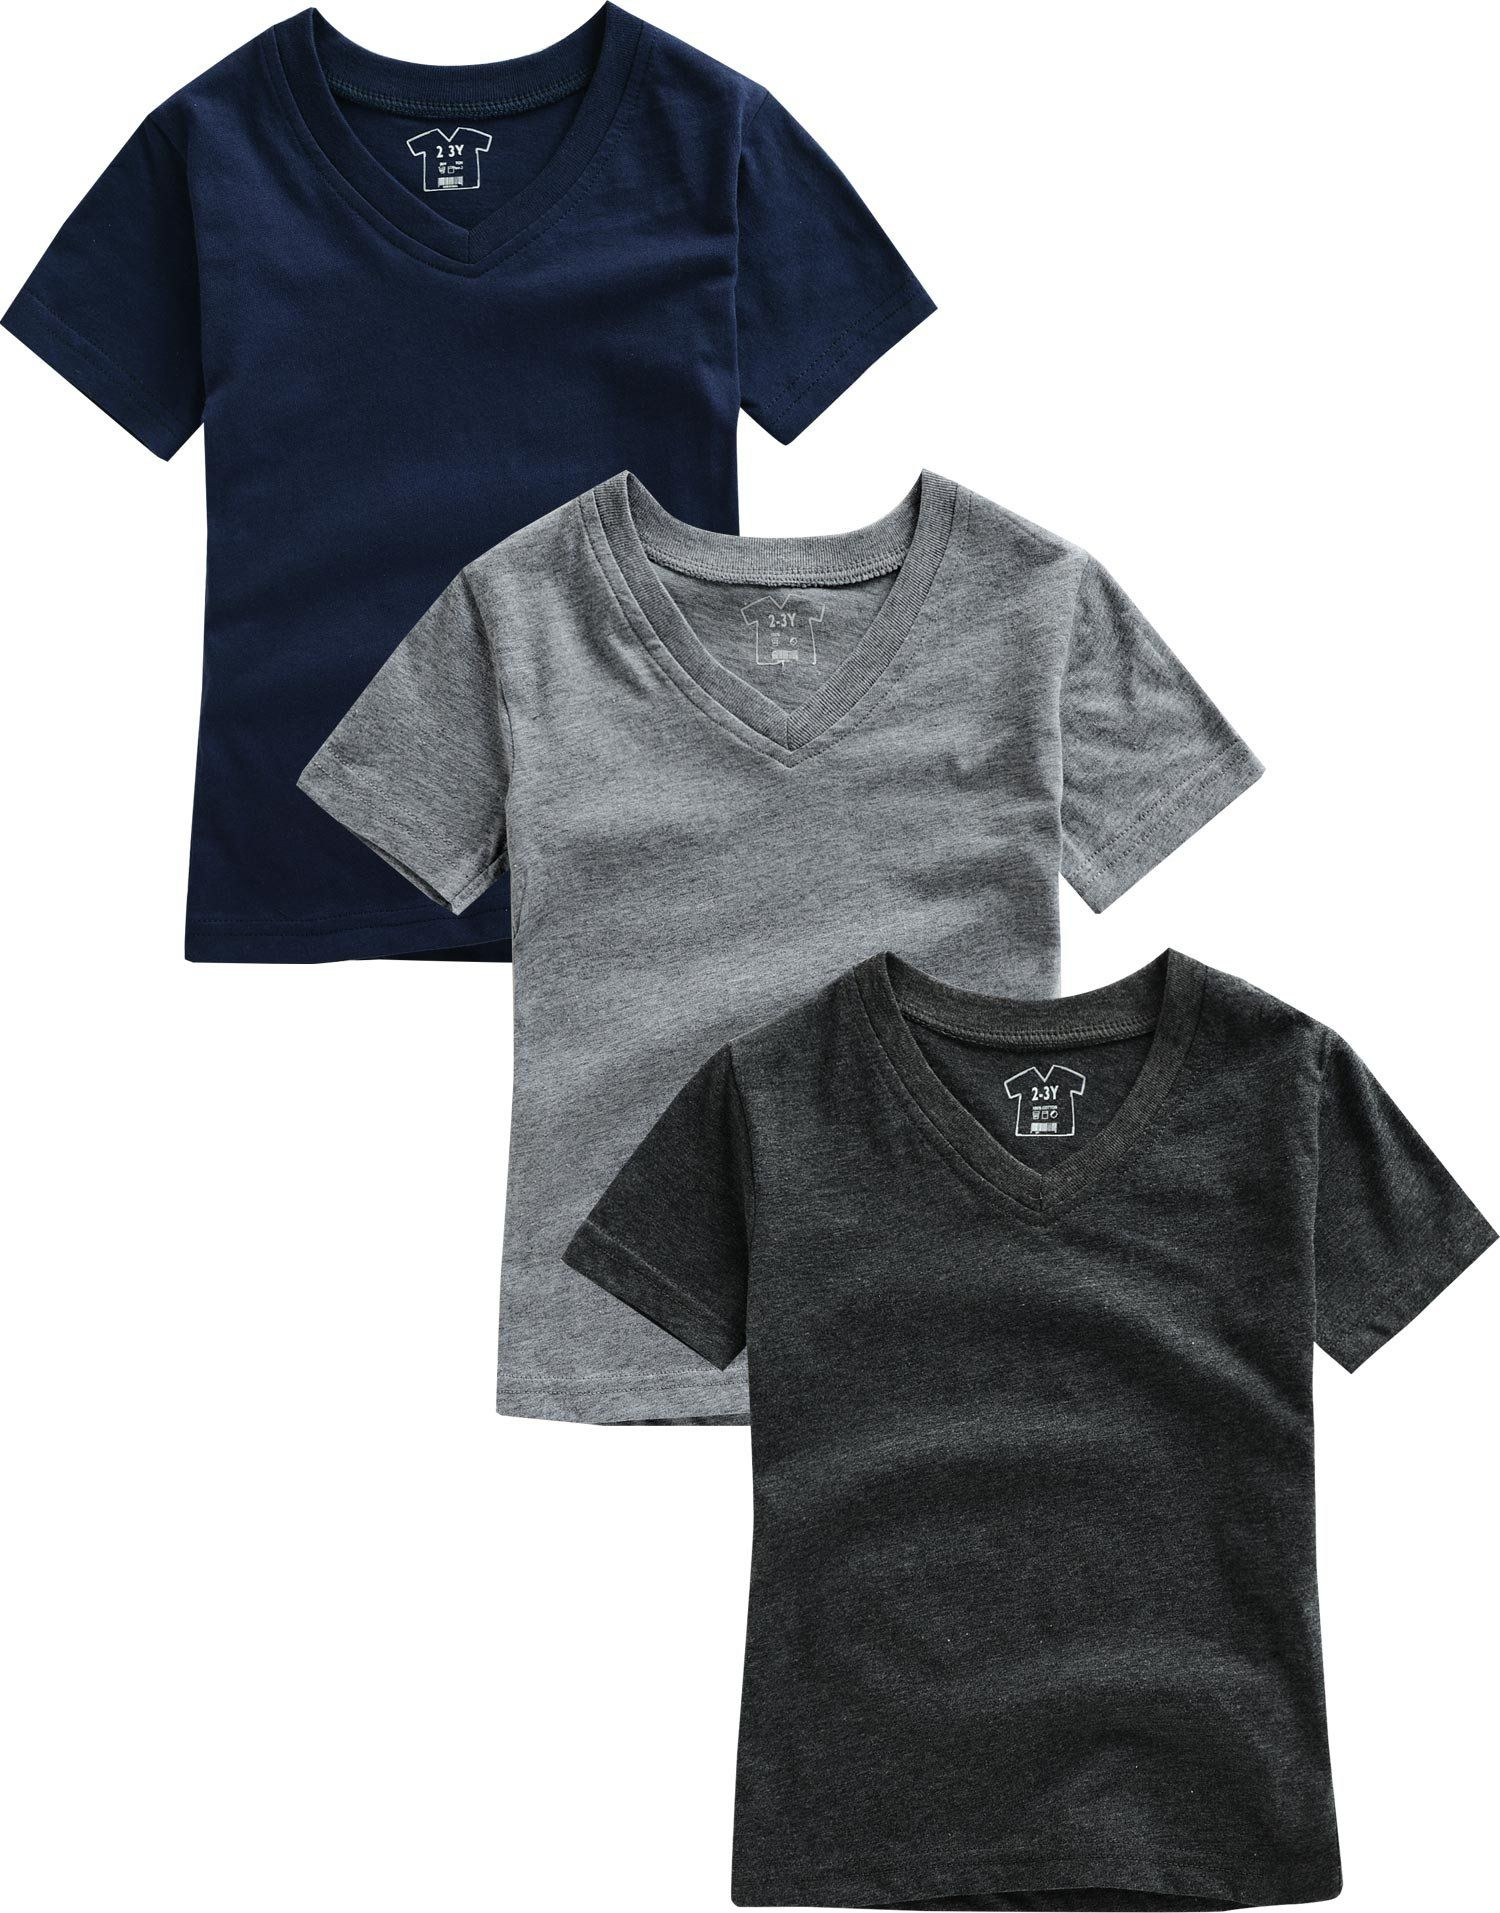 Vaenait baby 3 Pack 2T-7T Boys Short Sleeve V-Neck Basic Tee T-Shirts